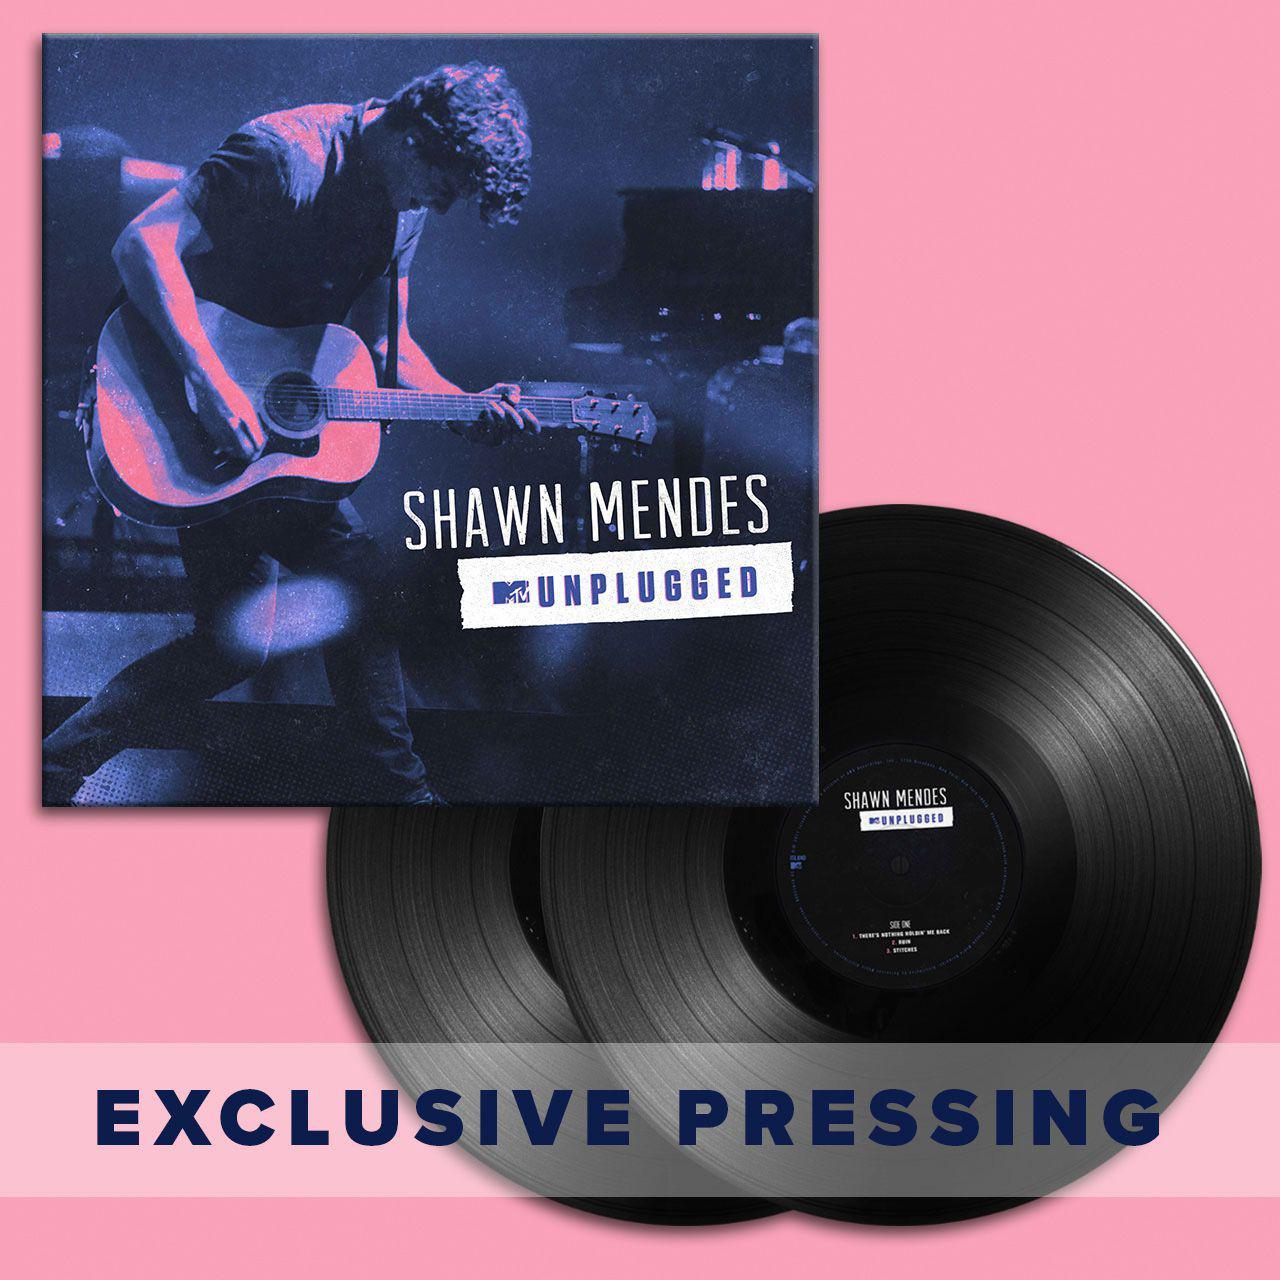 Shawn Mendes Unplugged Exclusive Double-LP (Vinyl)